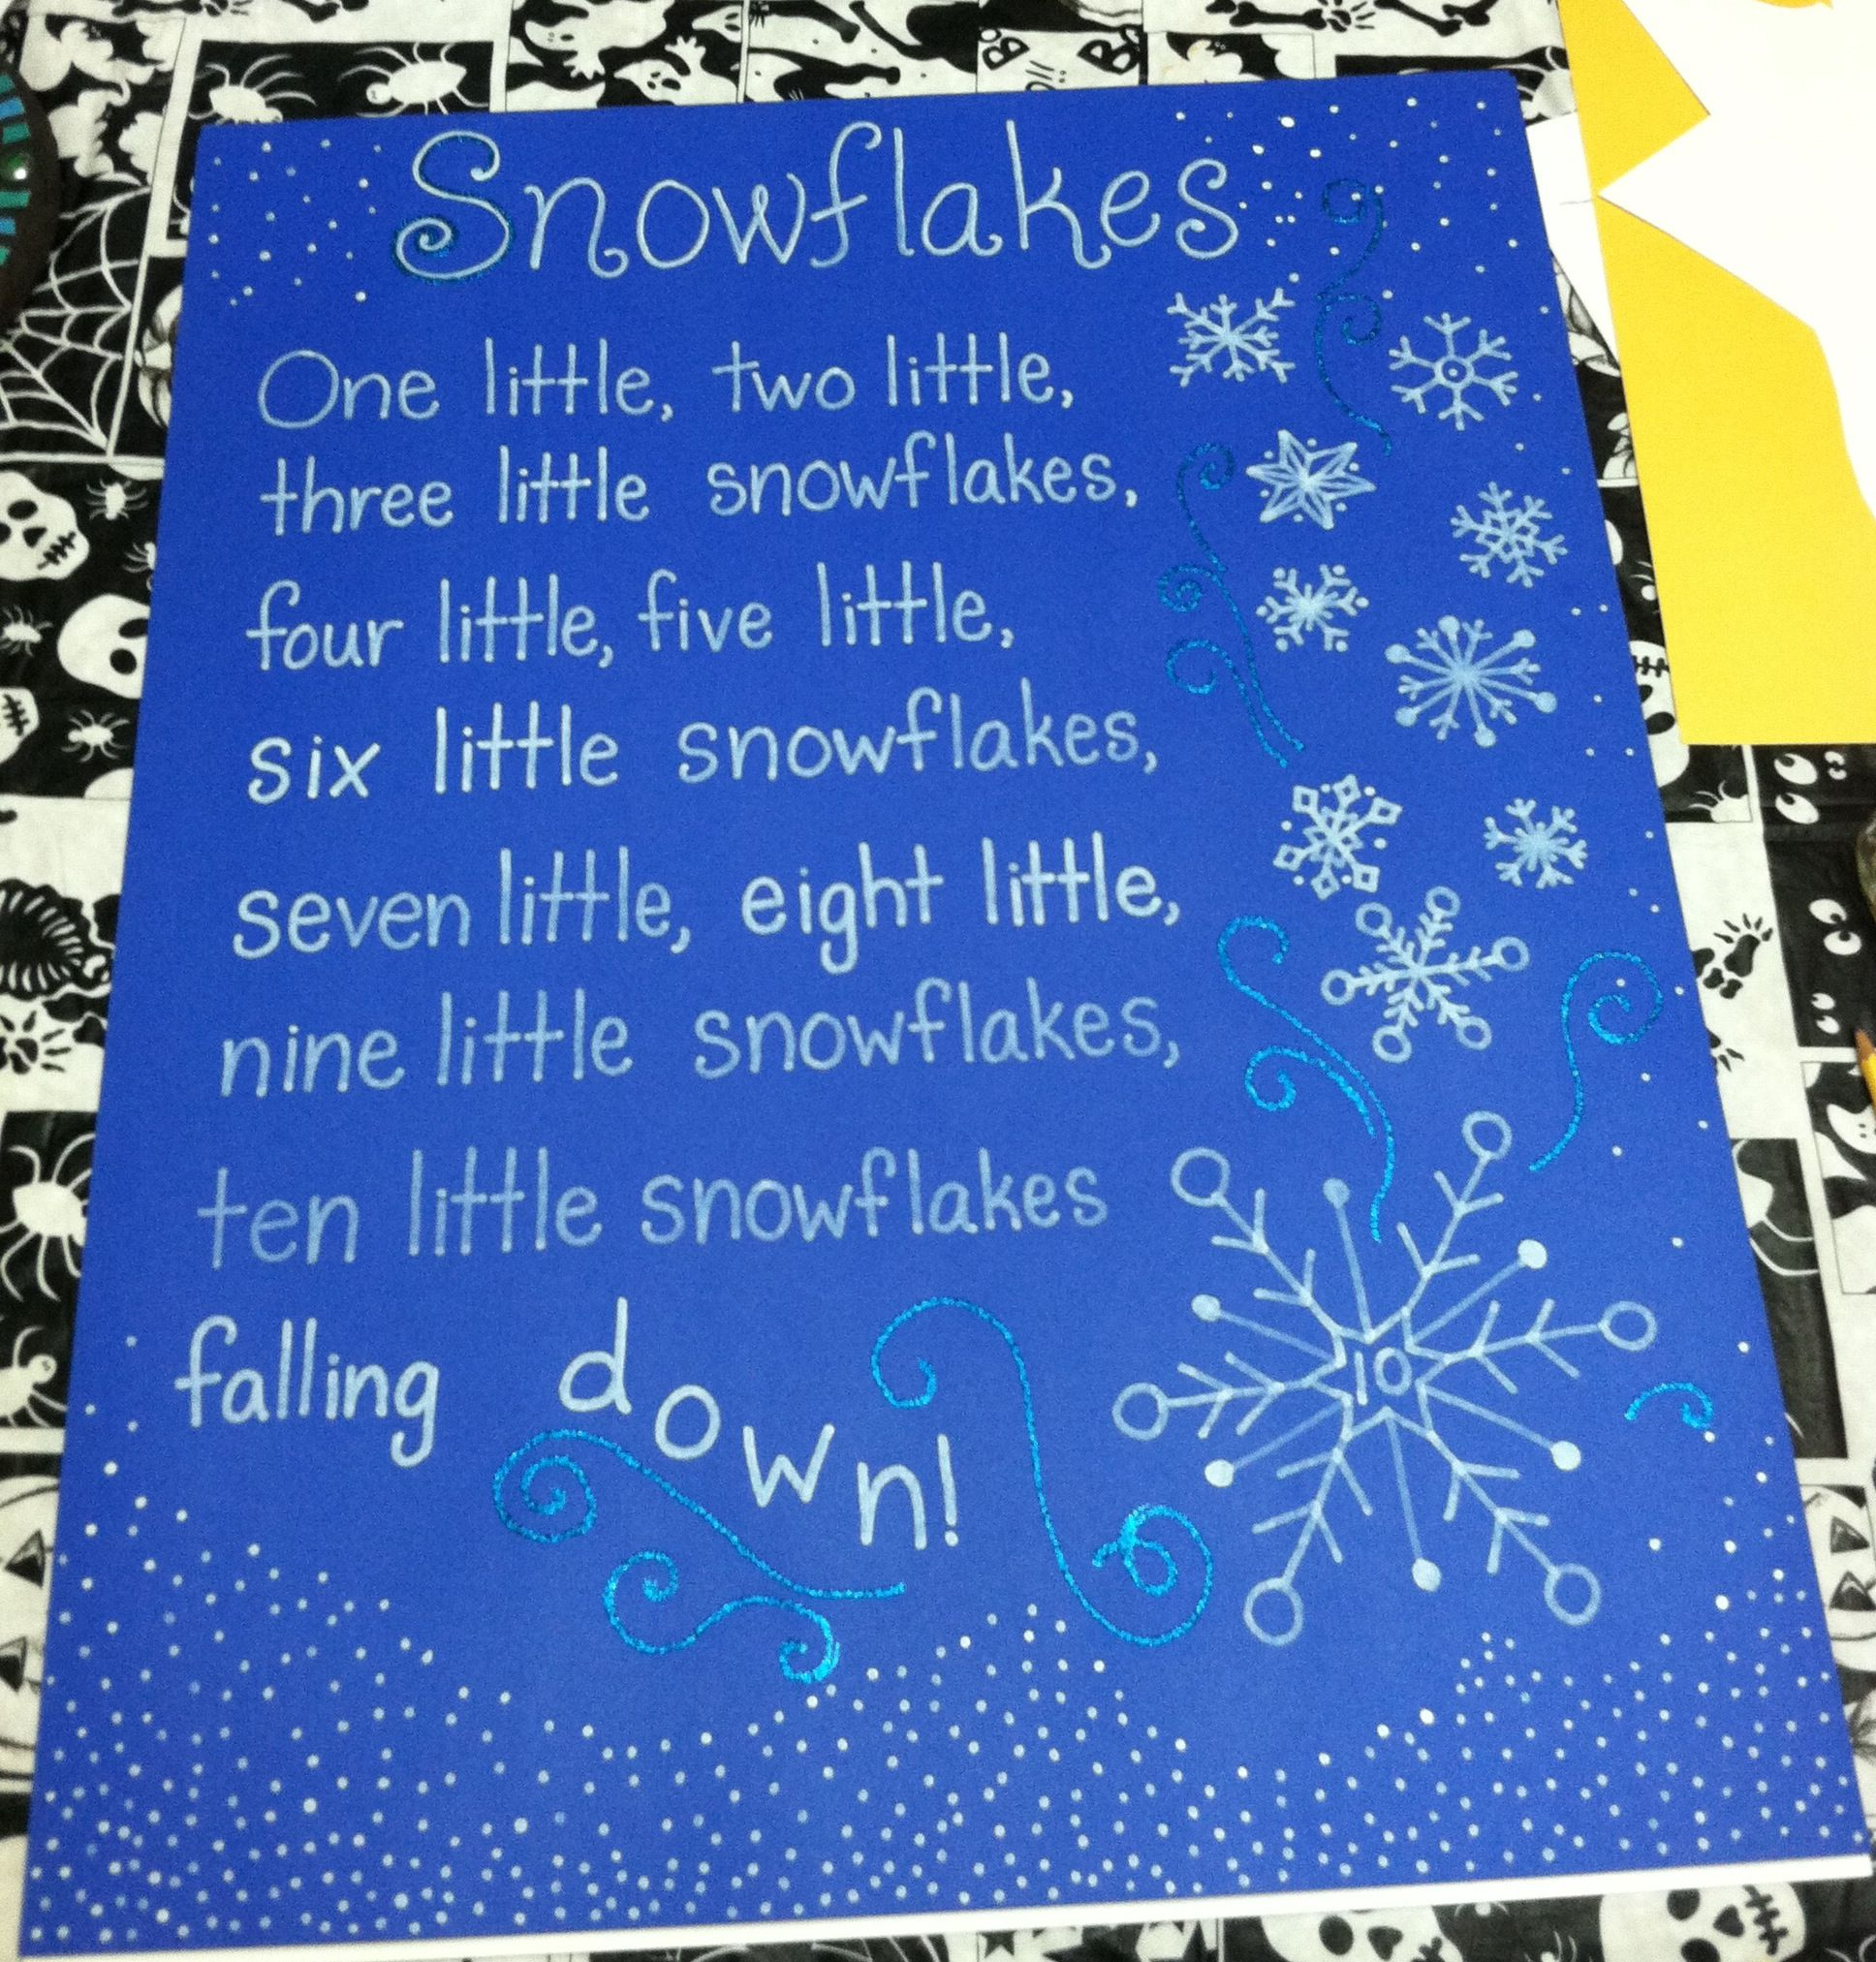 Snowflake poem song tag board kindergarten classroom